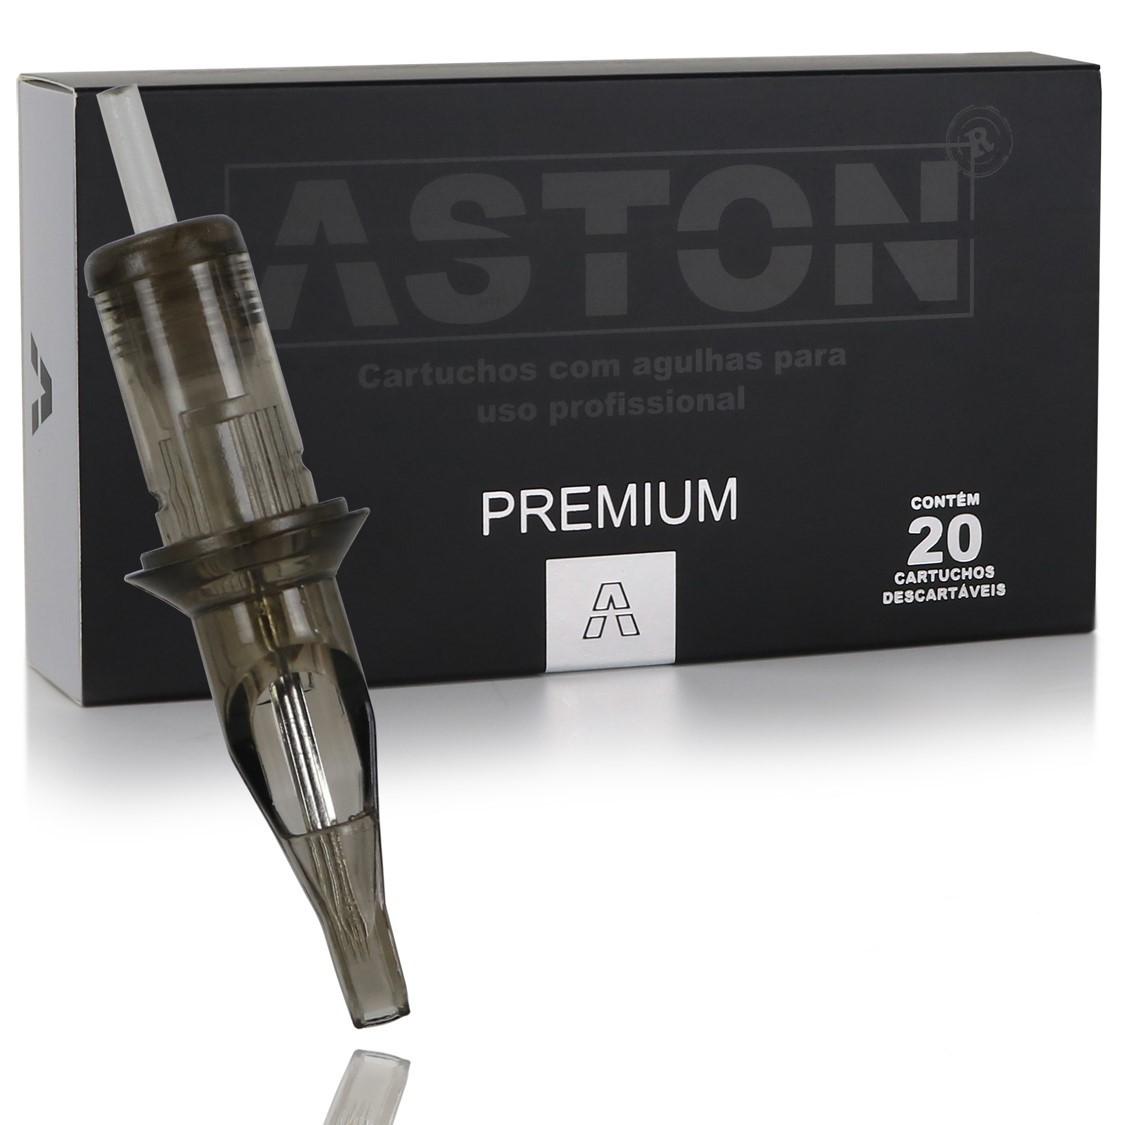 CARTUCHO ASTON PREMIUM BUCHA RS - 1205RS